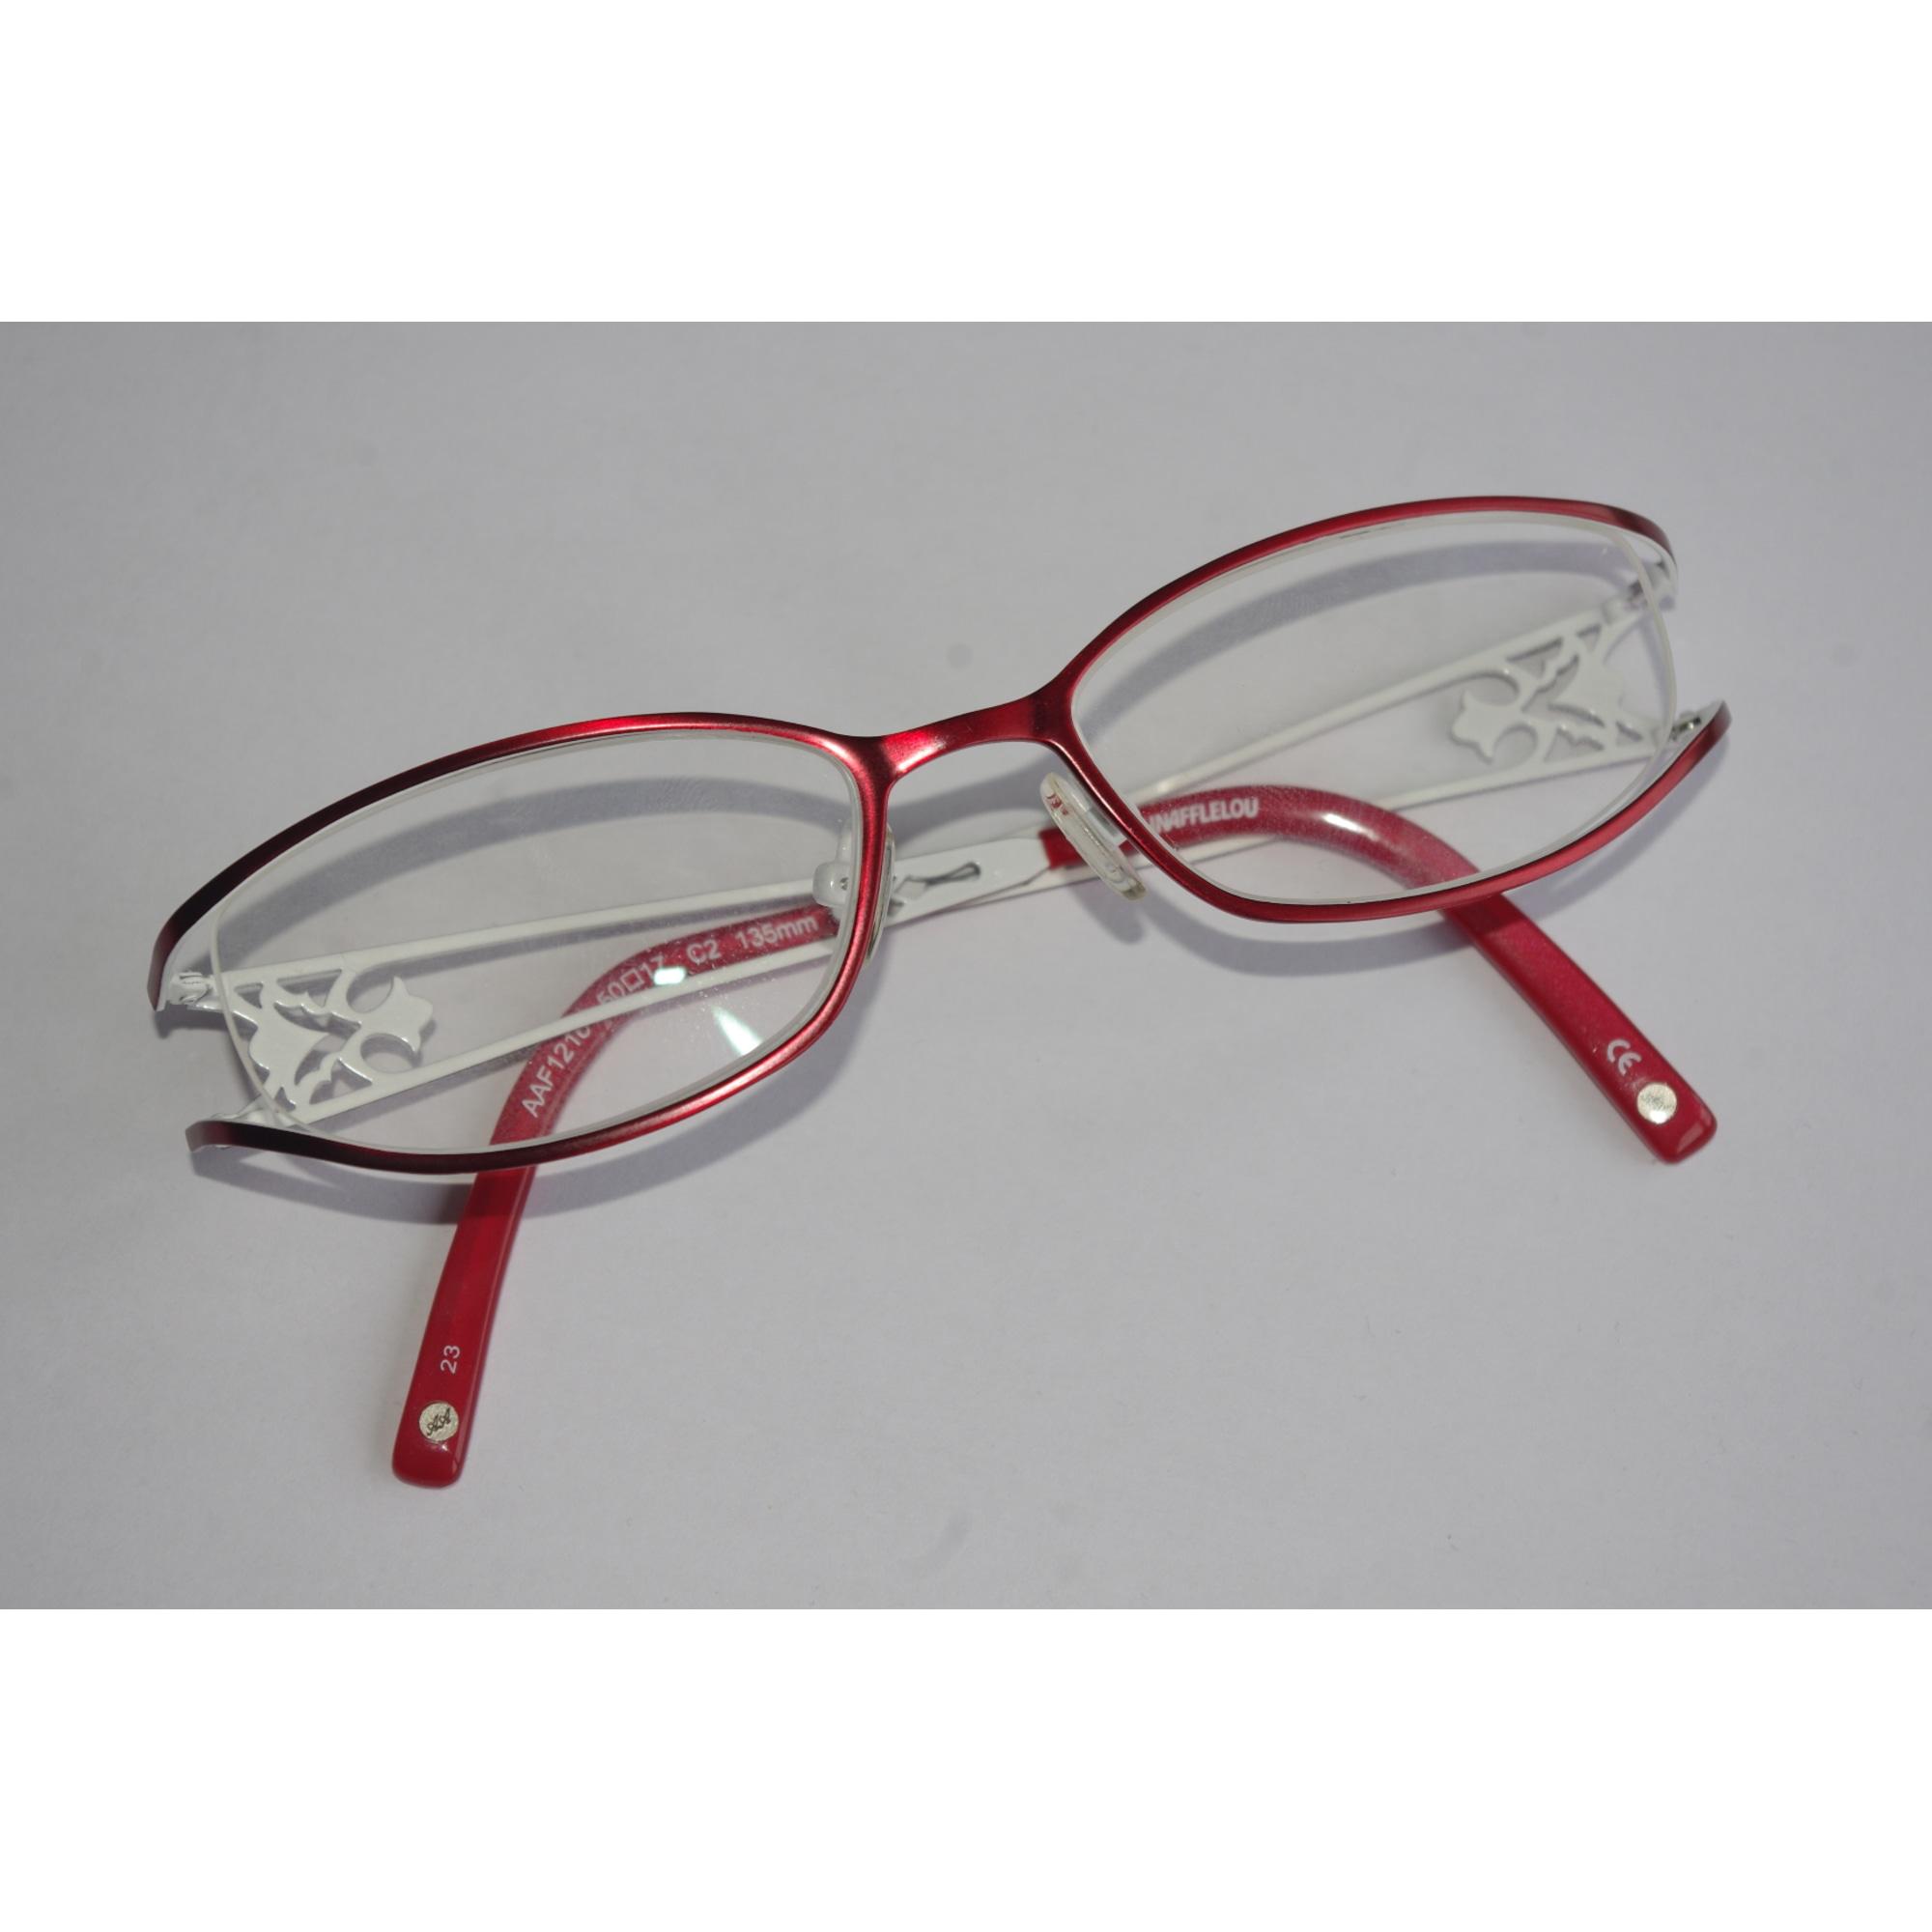 monture lunette ray ban afflelou